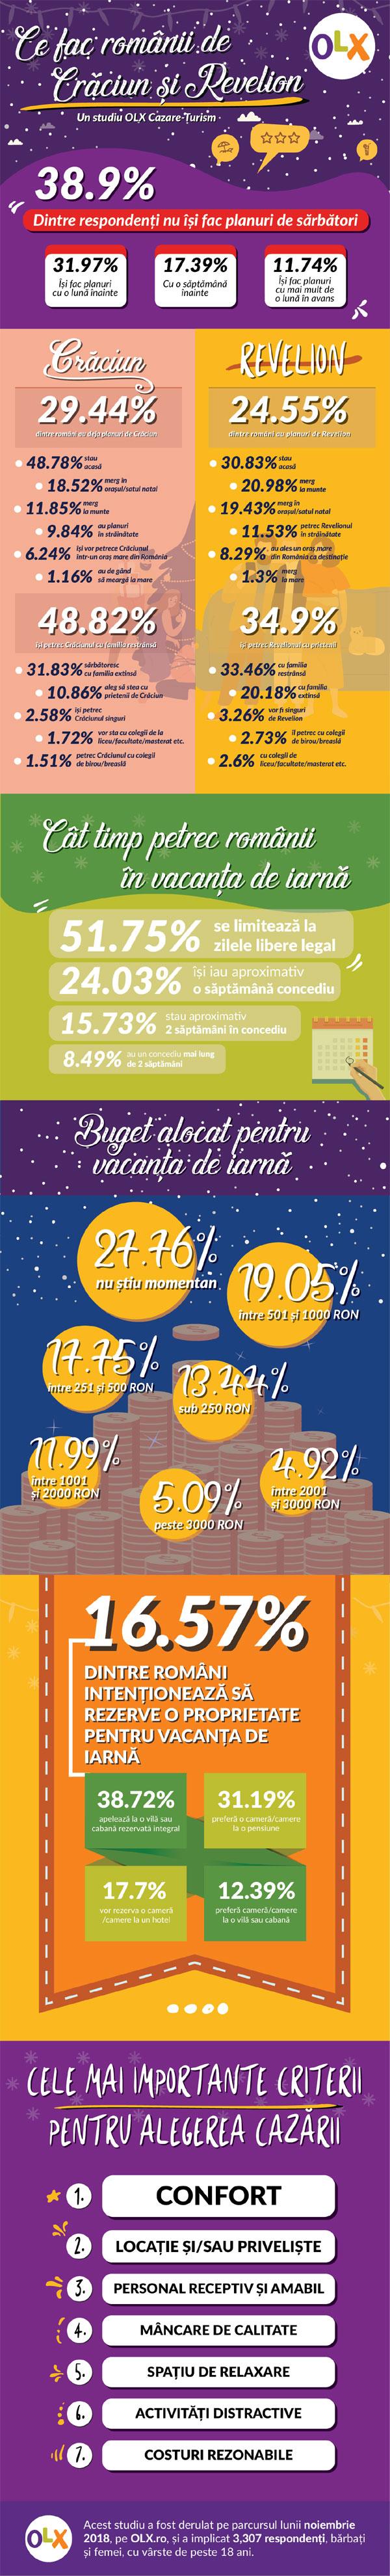 Infografic OLX, Ce fac romanii de Craciun si Revelion